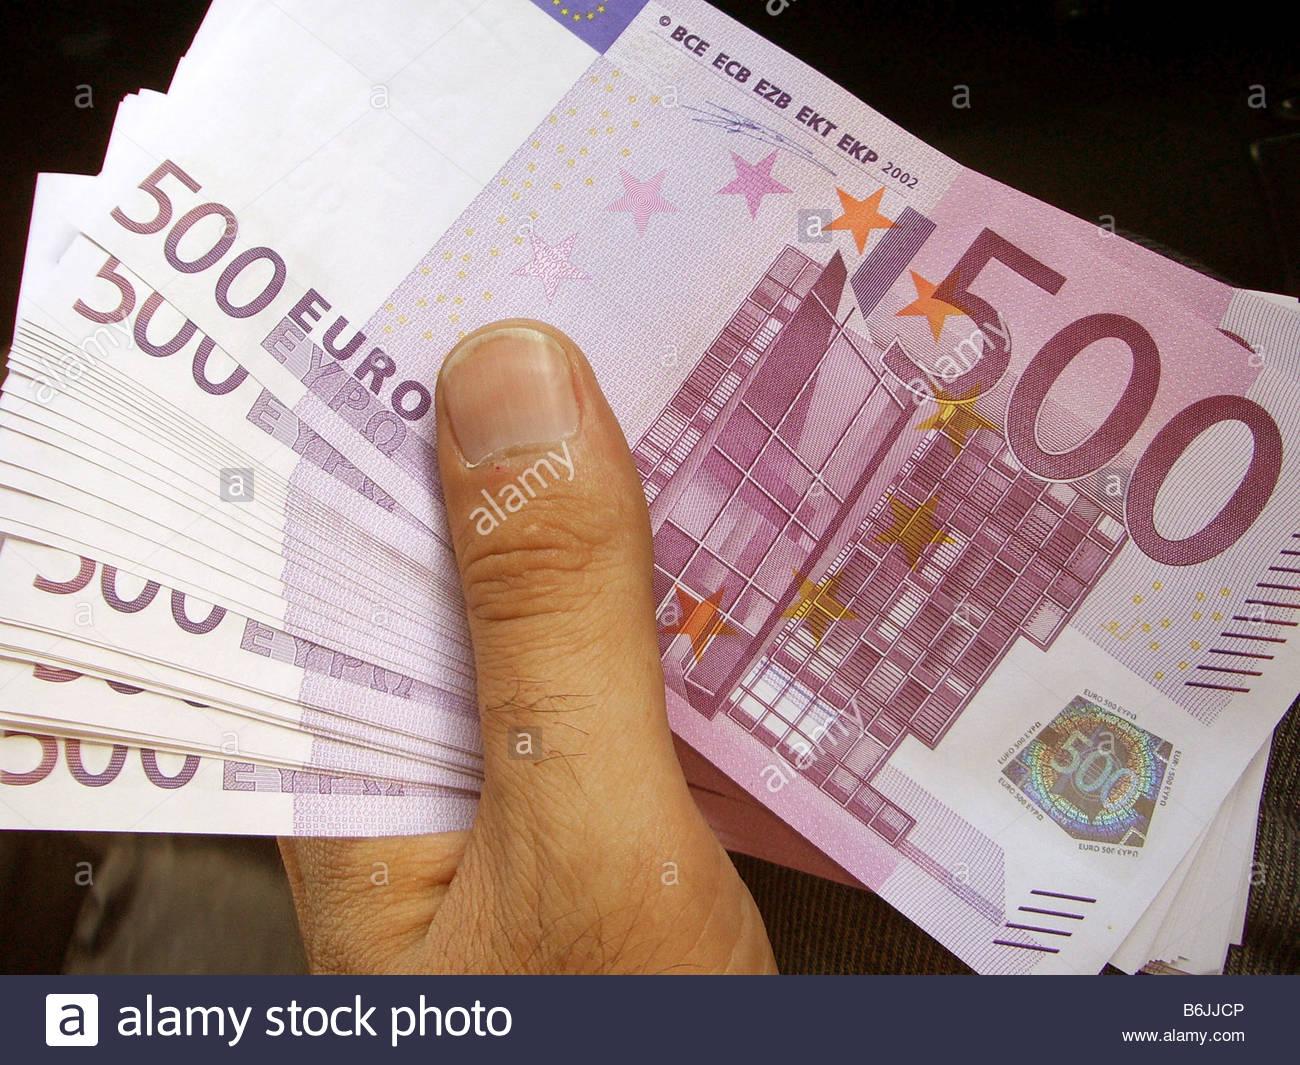 money euro euros eur notes europe european cash 500 1000. Black Bedroom Furniture Sets. Home Design Ideas